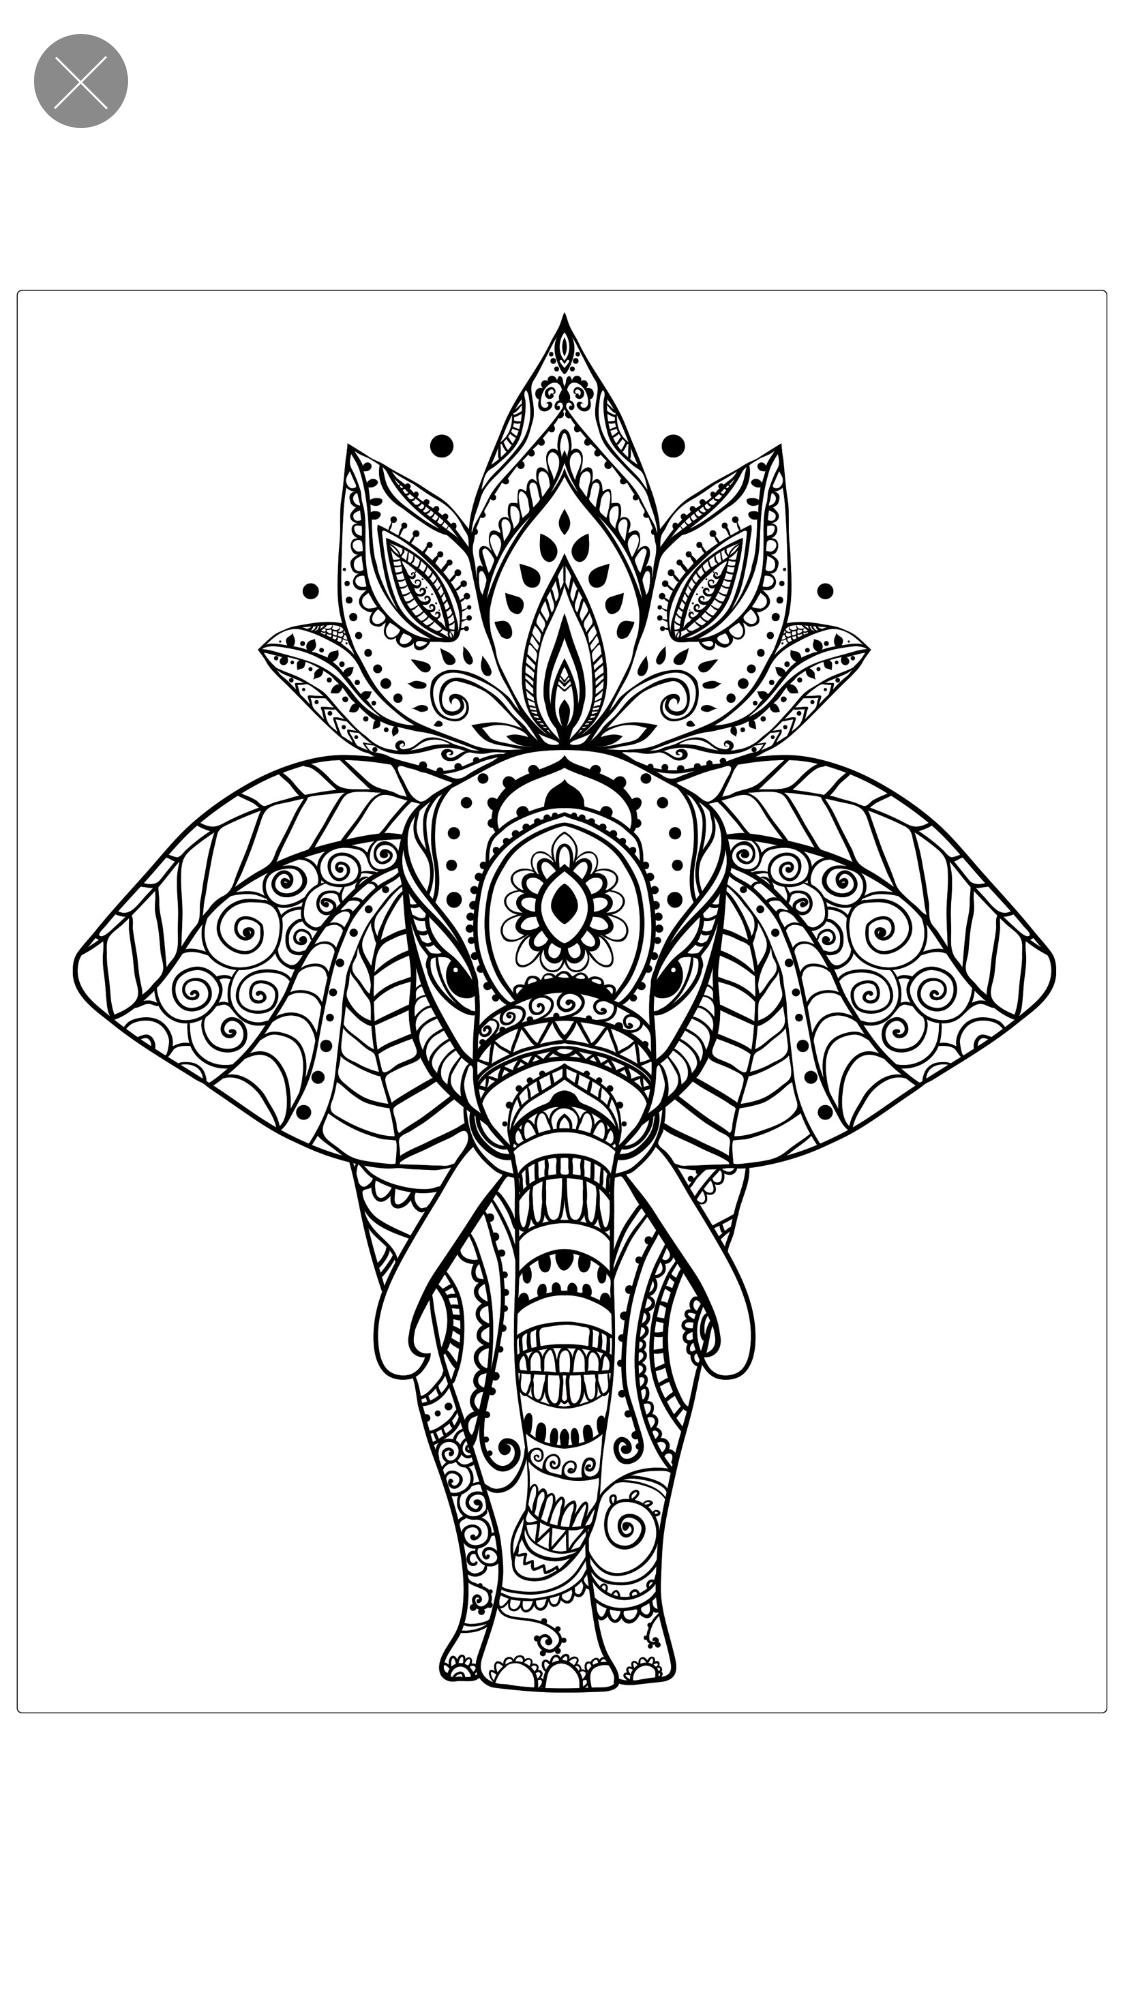 Pin de manuela en amor | Pinterest | Elefante mandala, Zentangle y ...